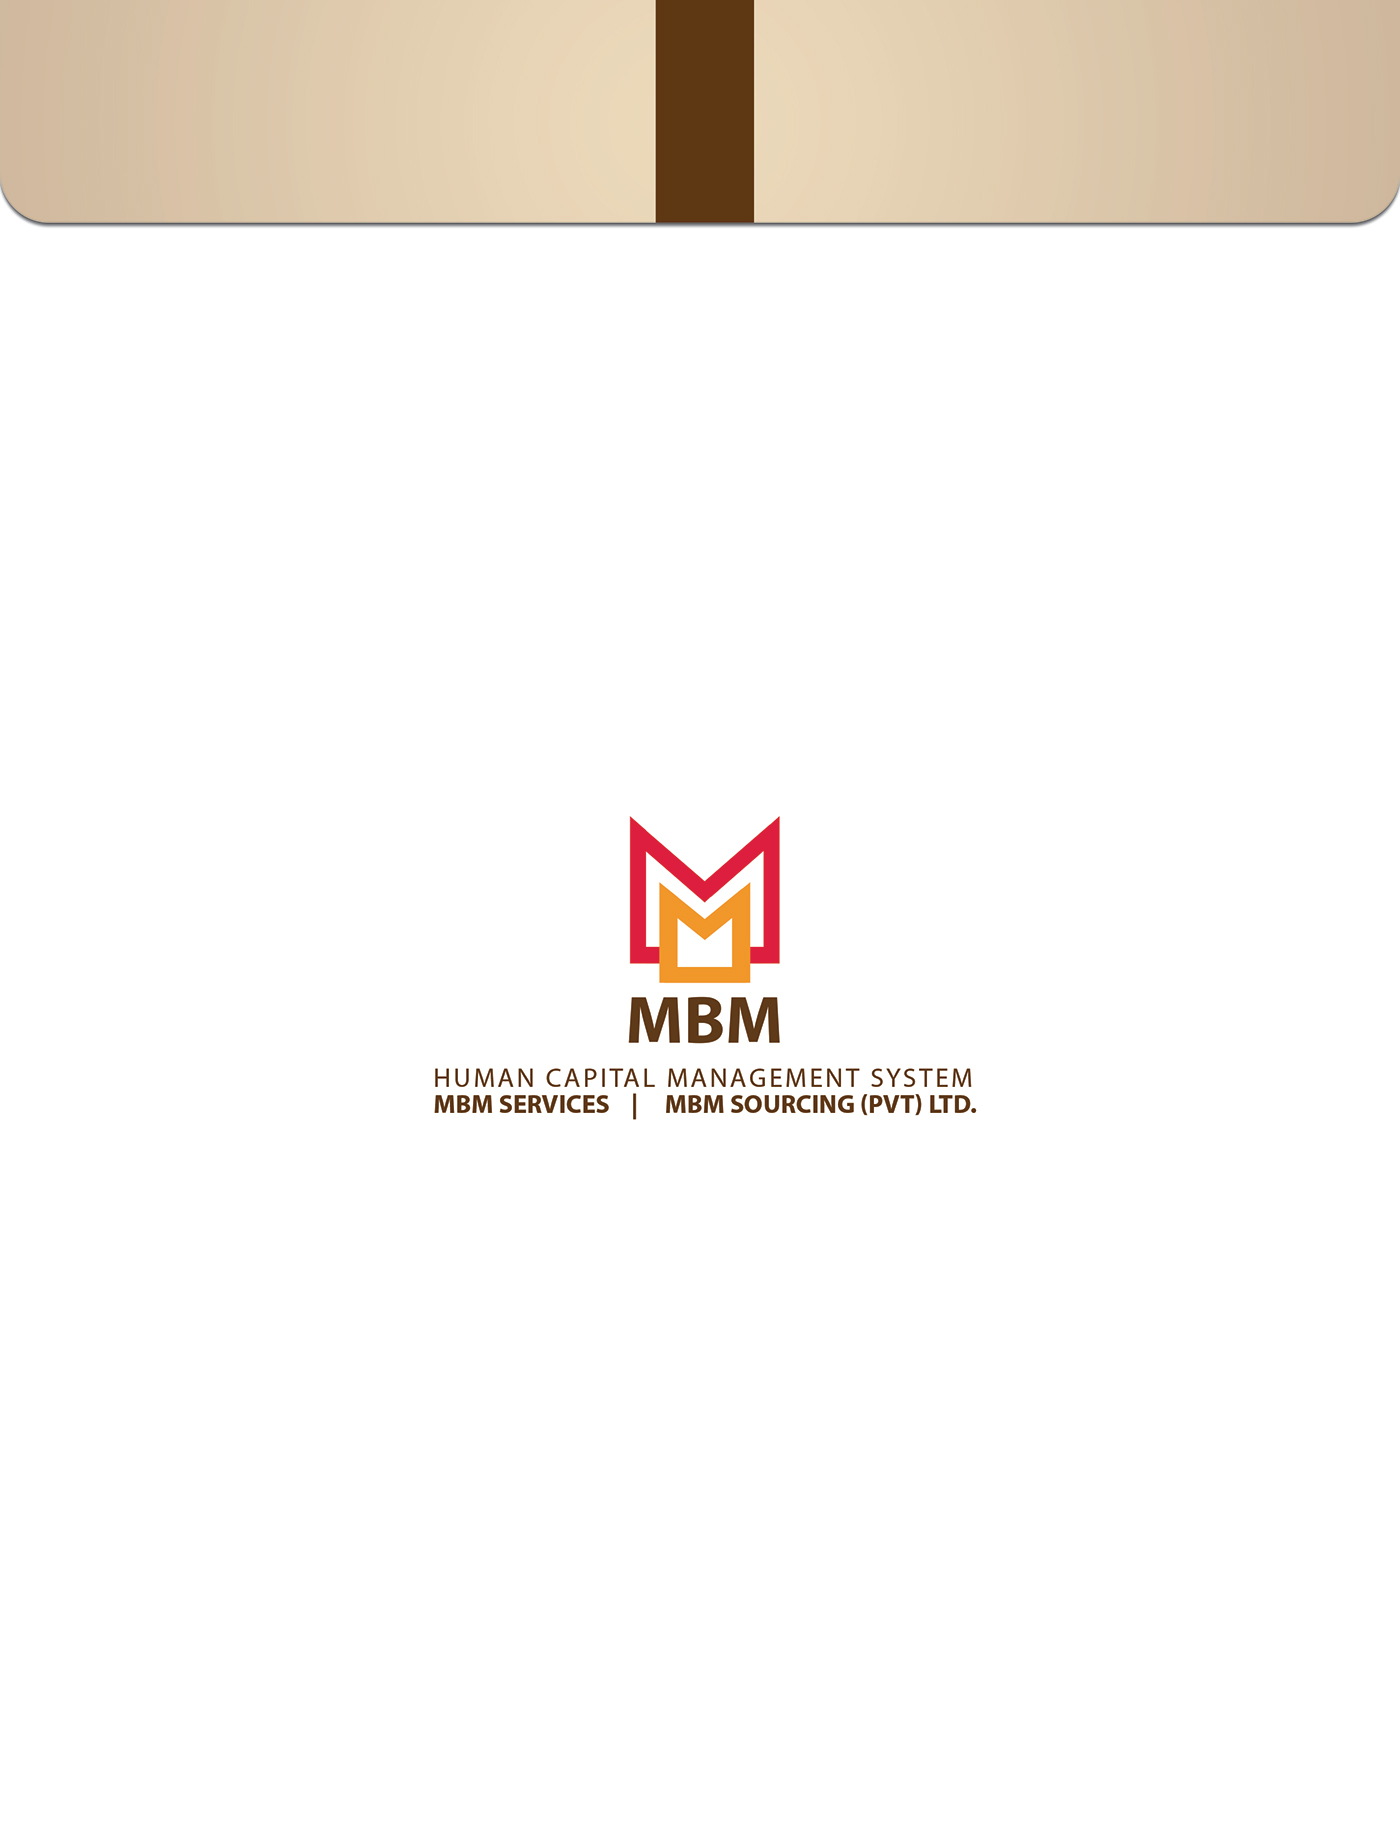 brand identity Logo Design business card mockups psd muckup Photography